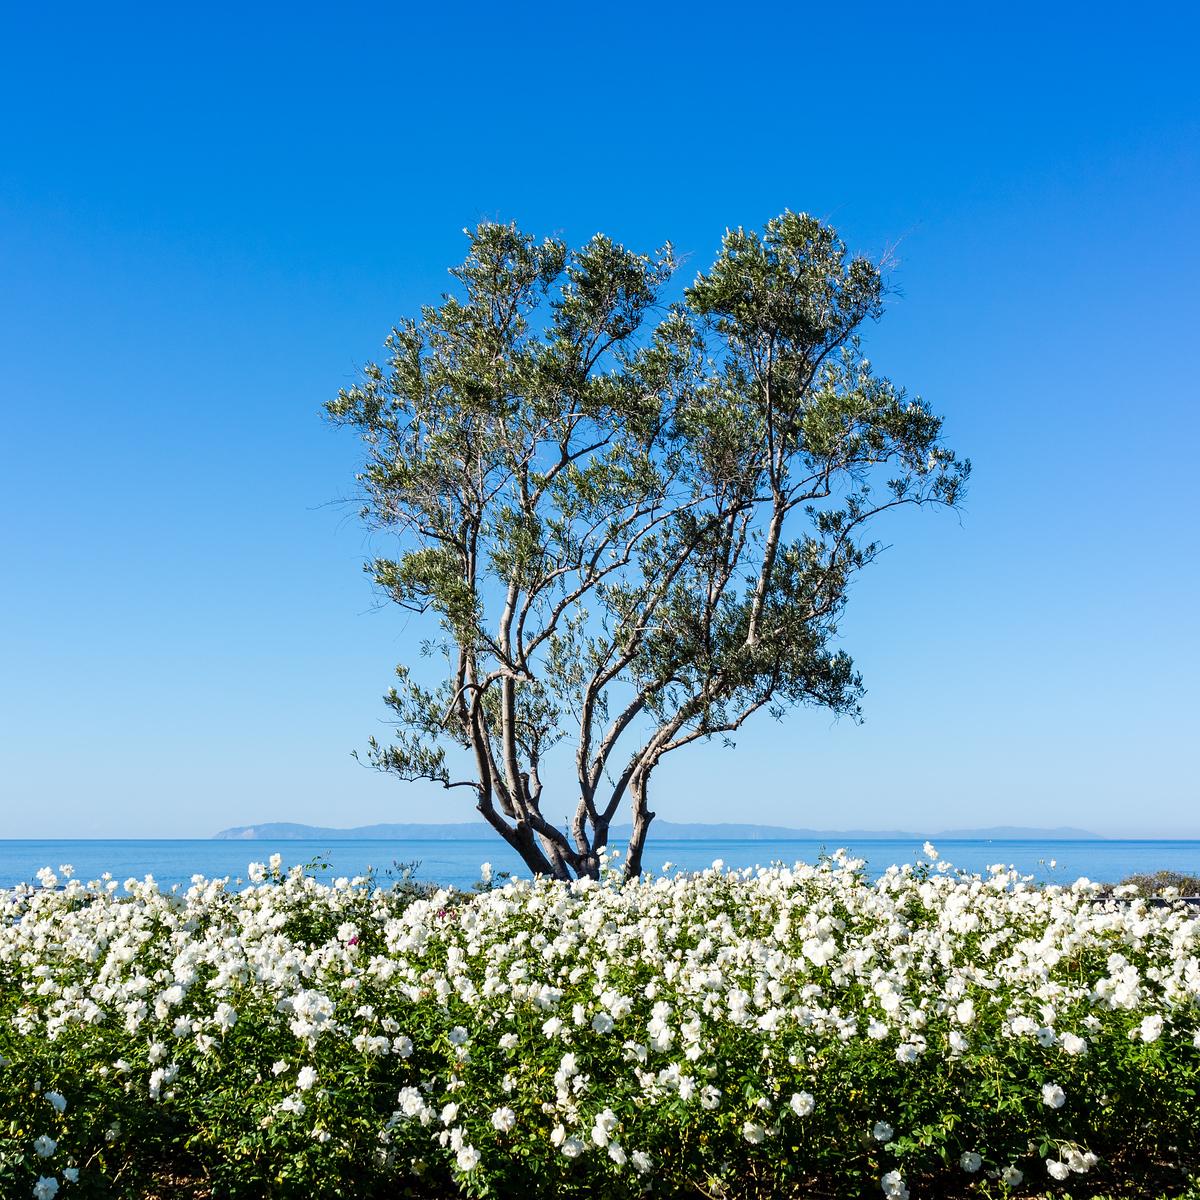 Crystal Cove, Laguna Beach, Newport Coast, Newport Beach, Orange County, California, United States